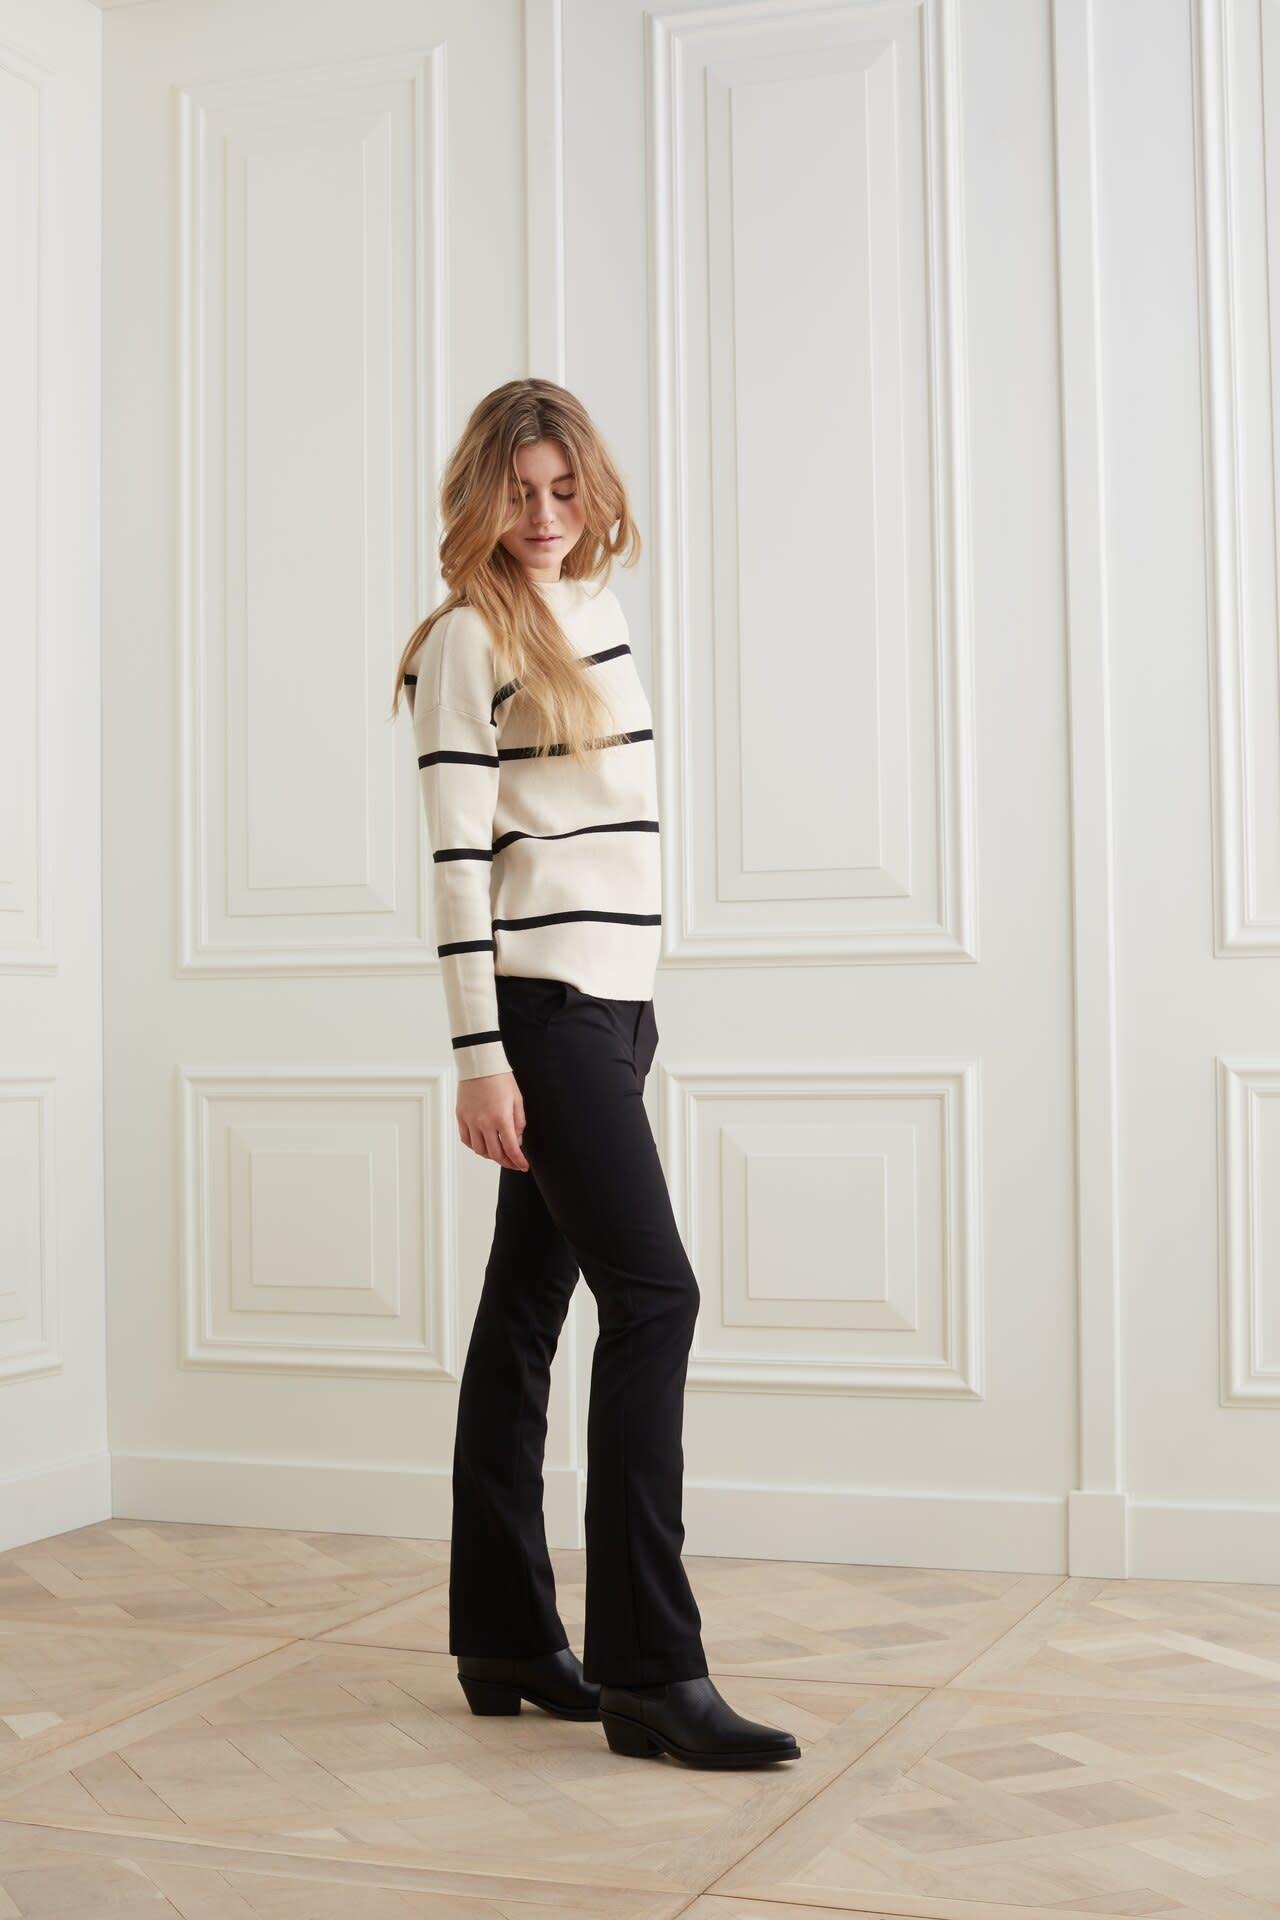 YAYA Women Jersey flare stretch pantalon in a cotton blend fabric